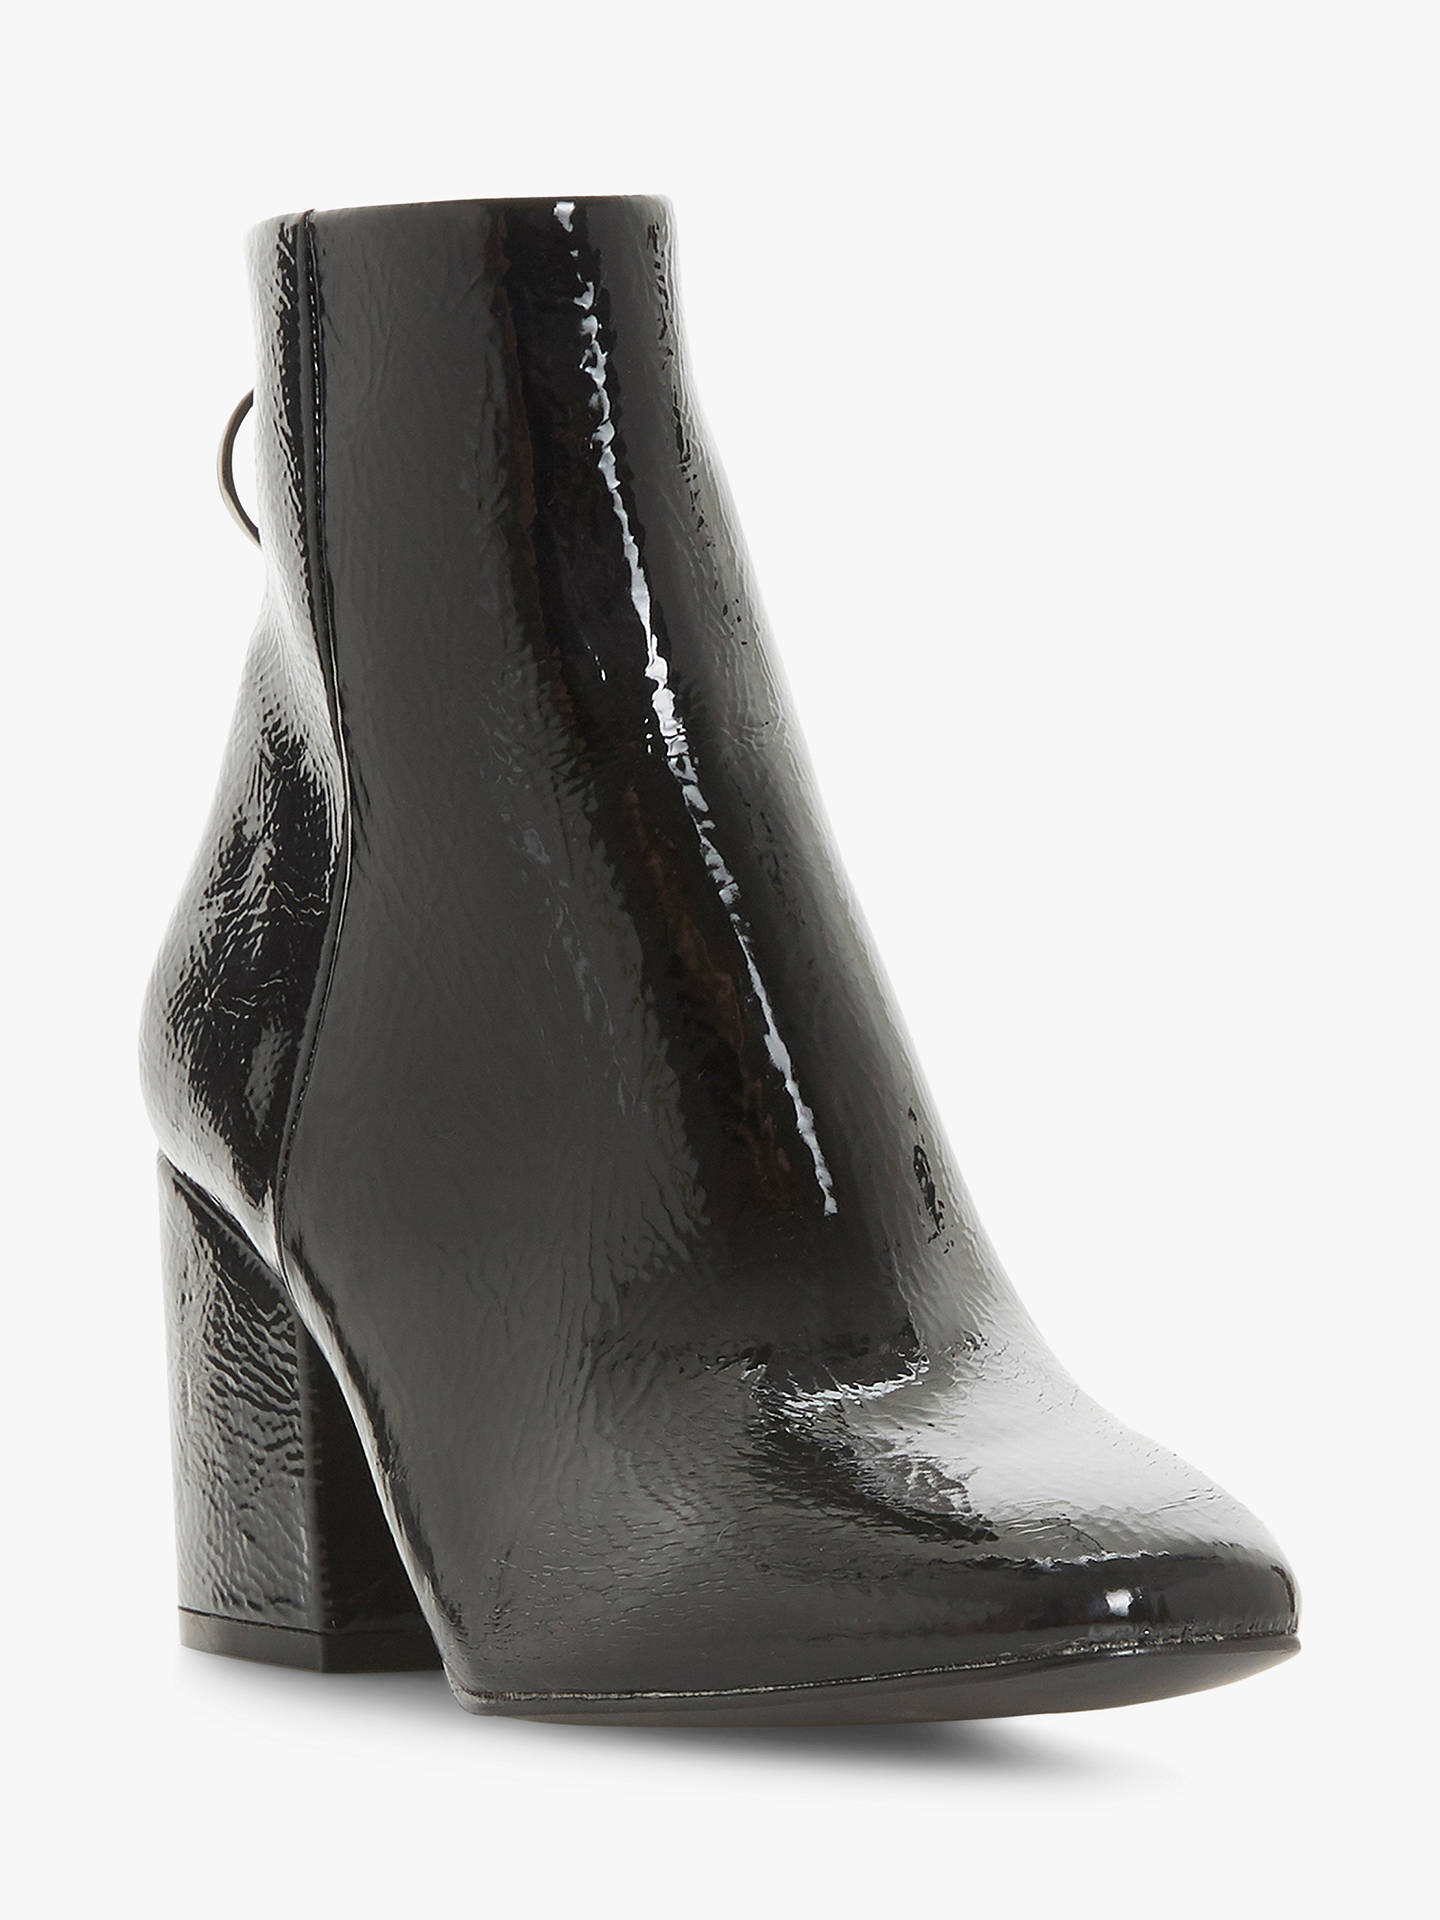 5a1509f6cc2 ... Buy Steve Madden Break O-Ring Patent Block Heel Ankle Boots, Black, 3  ...